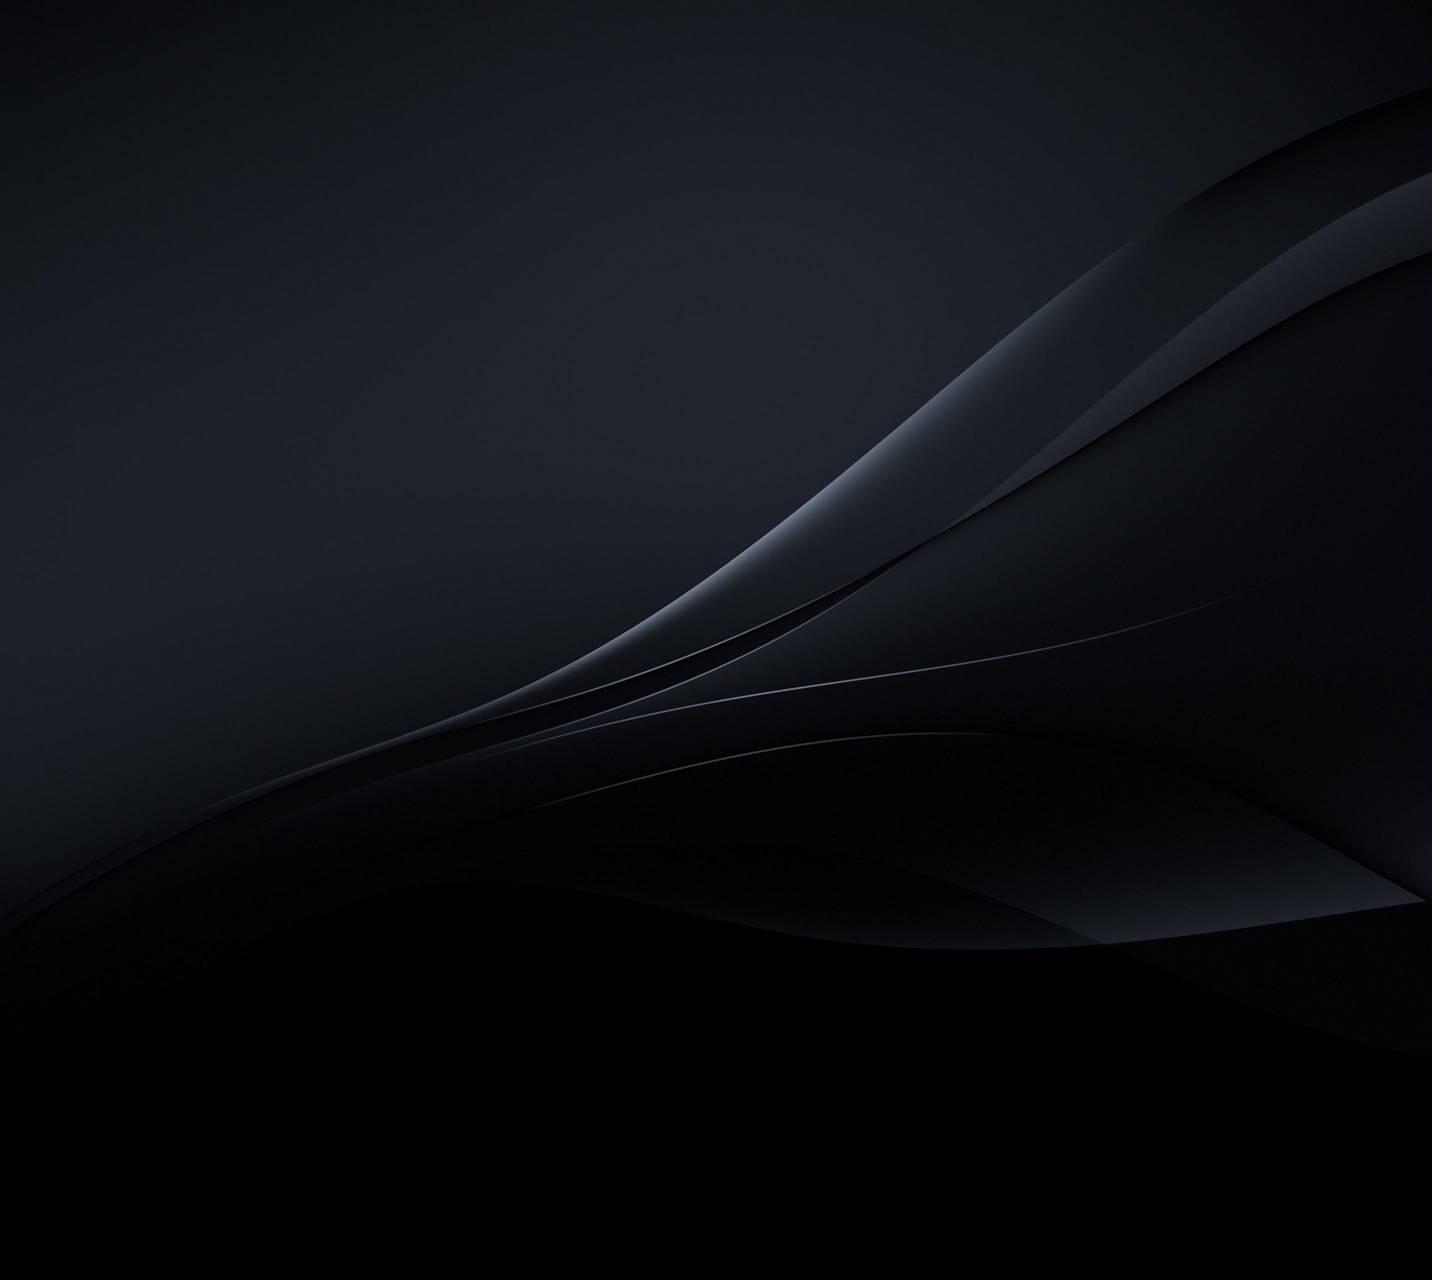 Xperia Z4 Black